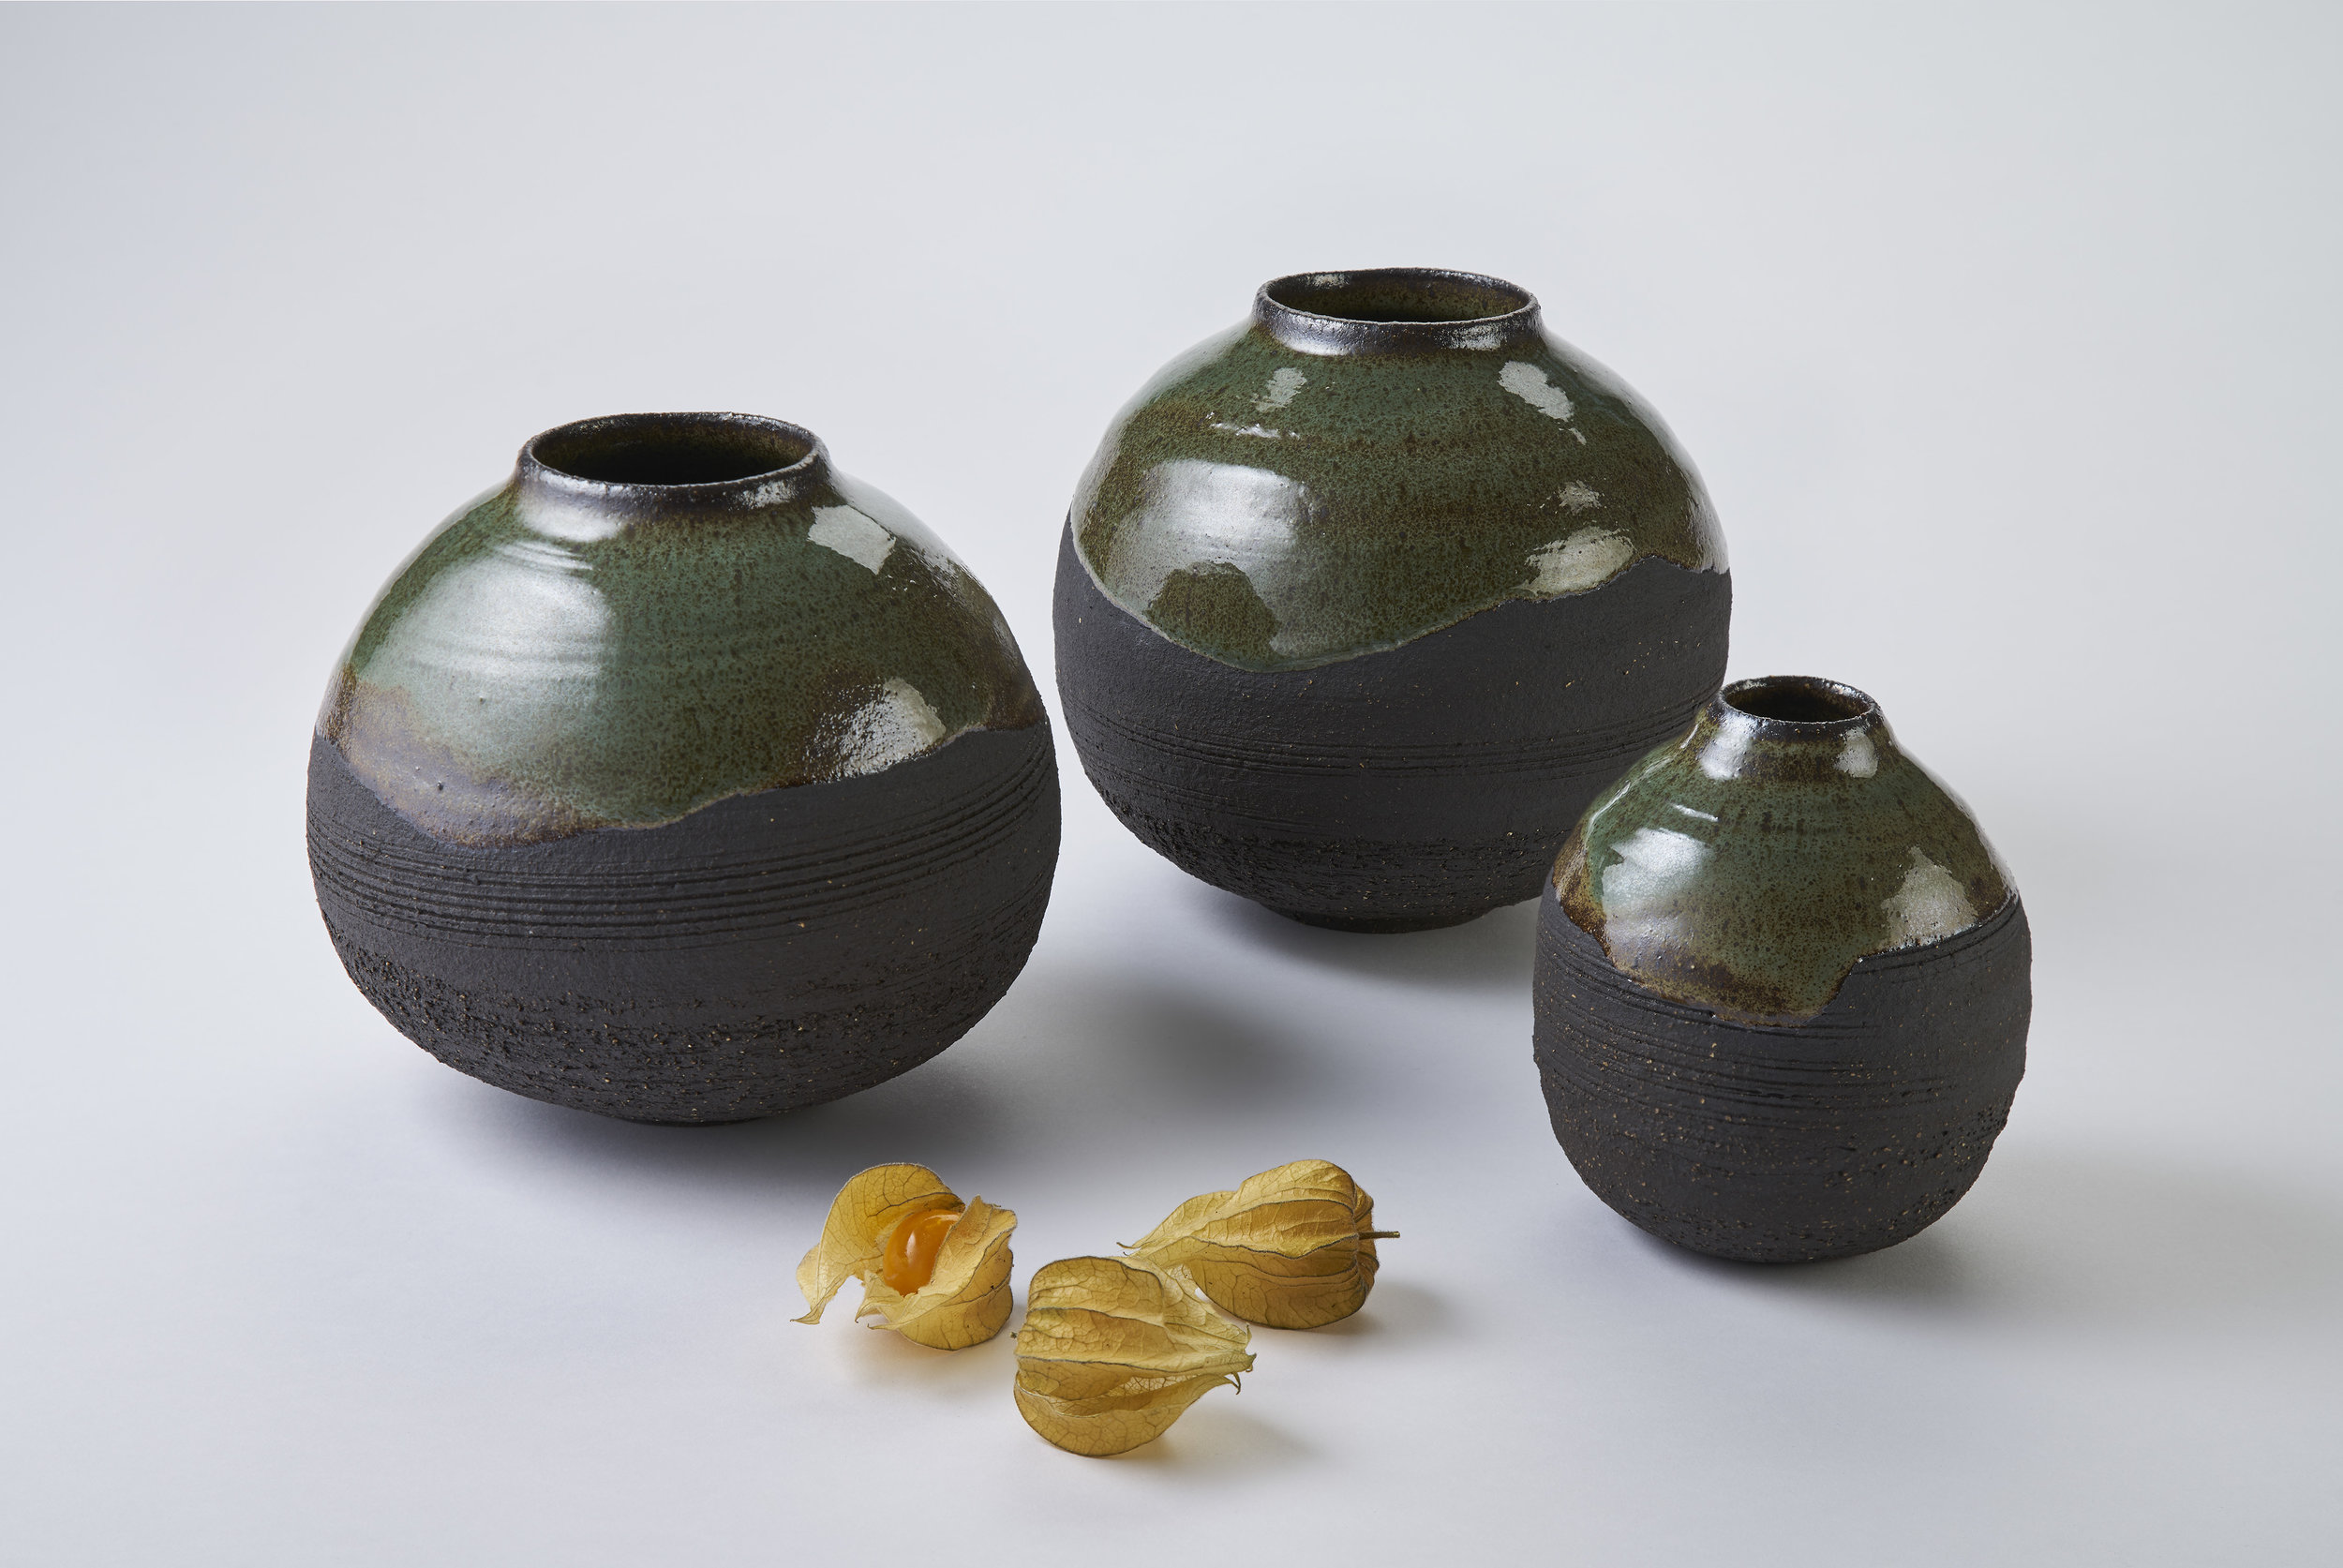 K A Ceramics Black stoneware moon jars, copper green gloss. Medium 6cm x 16cm, small 3cm x 12.5cm. Matthew Booth Photography.jpg